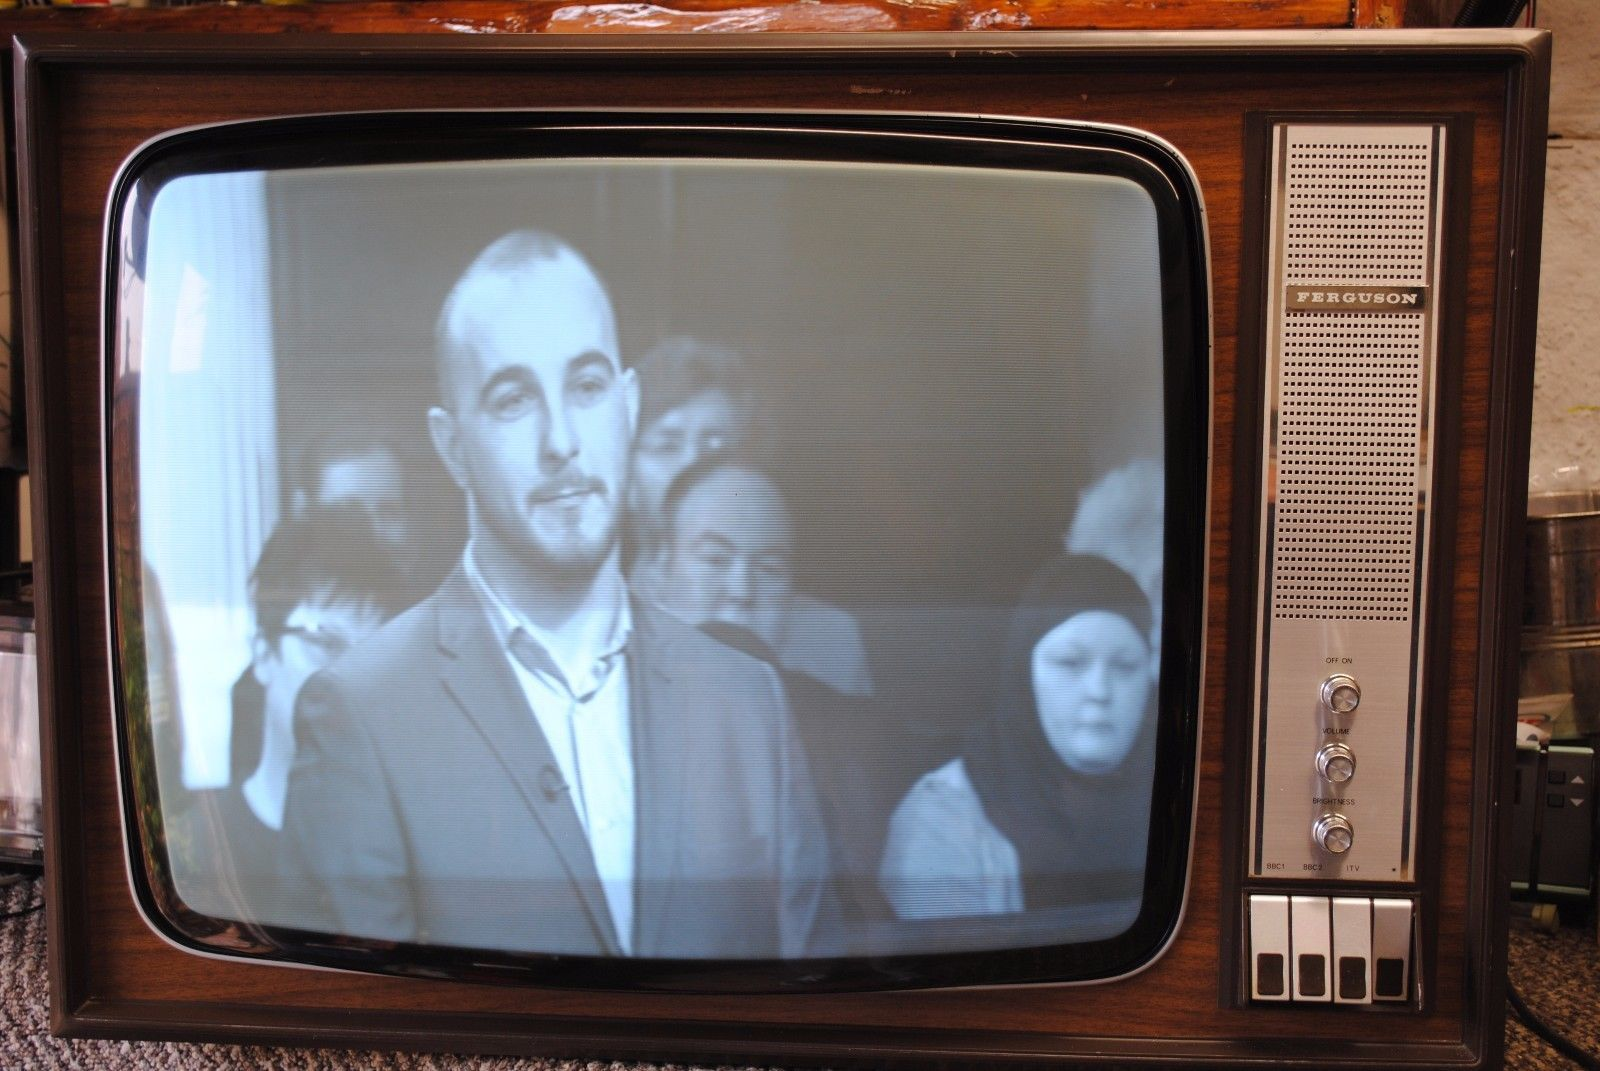 Vintage 1970s Ferguson 24 625 Line Black And White Valve Tv